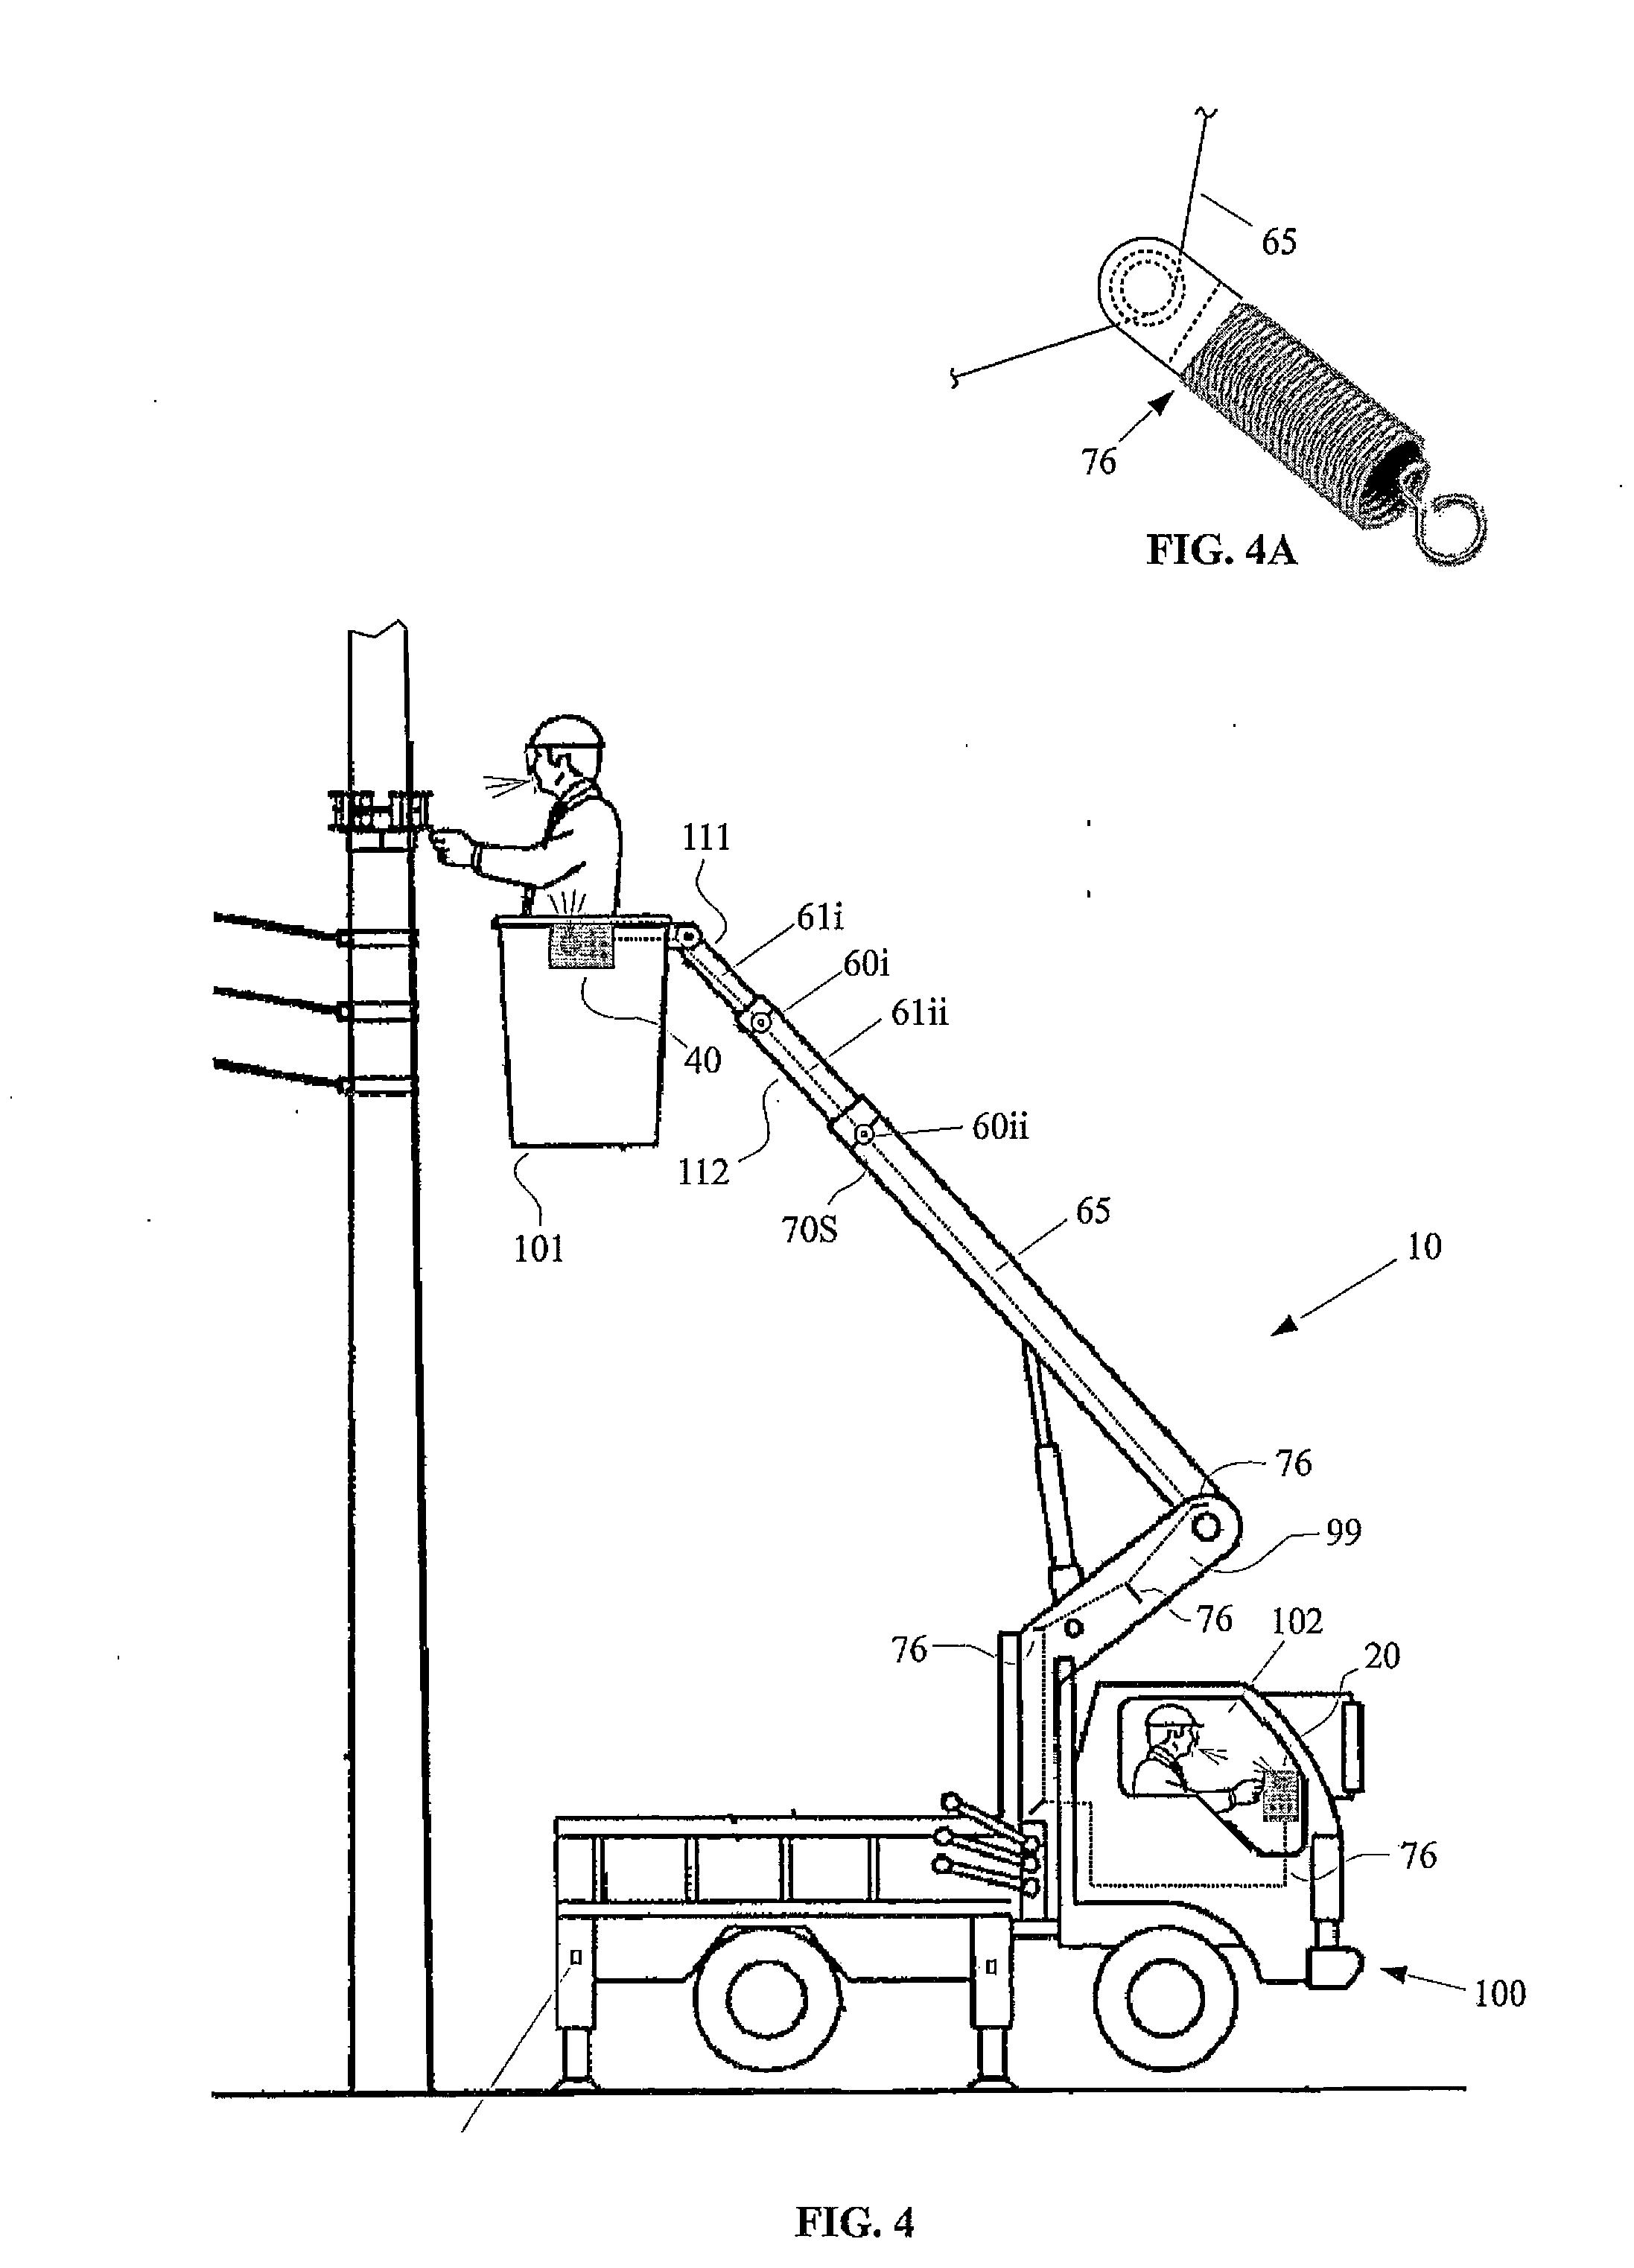 patente us20130209109